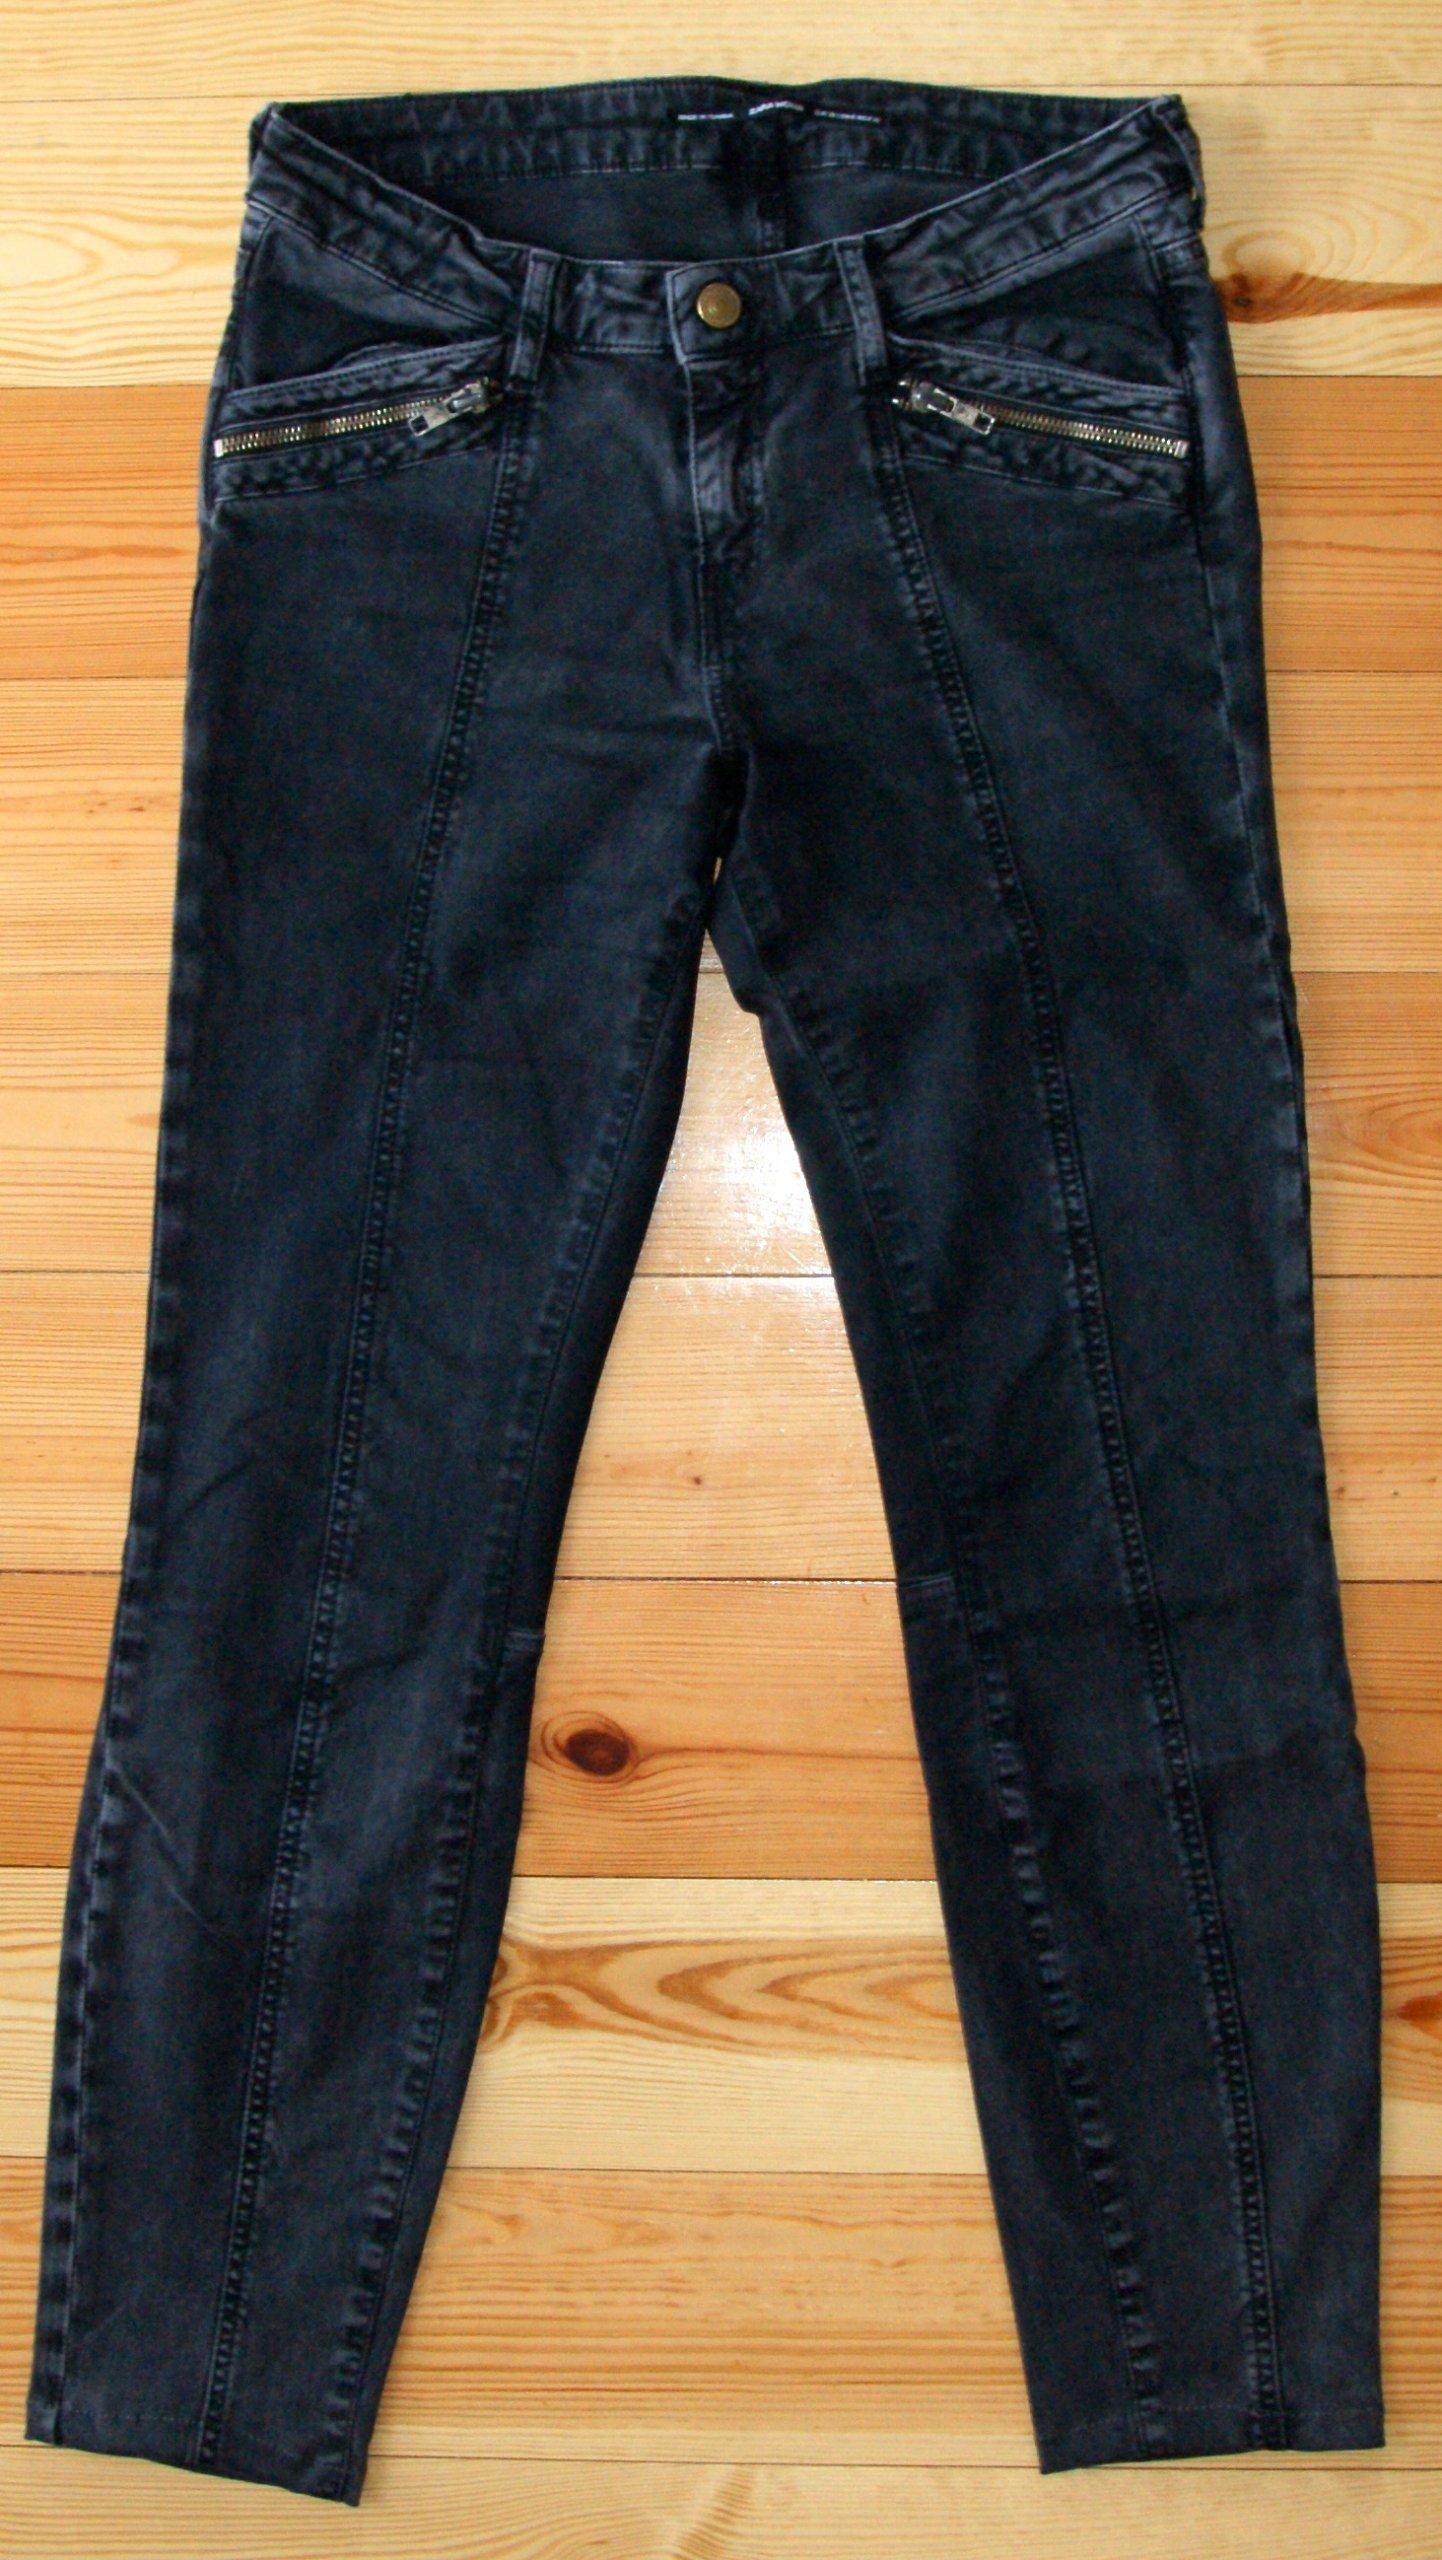 ZARA jeansy spodnie skinny marmurek 36 j.nowe